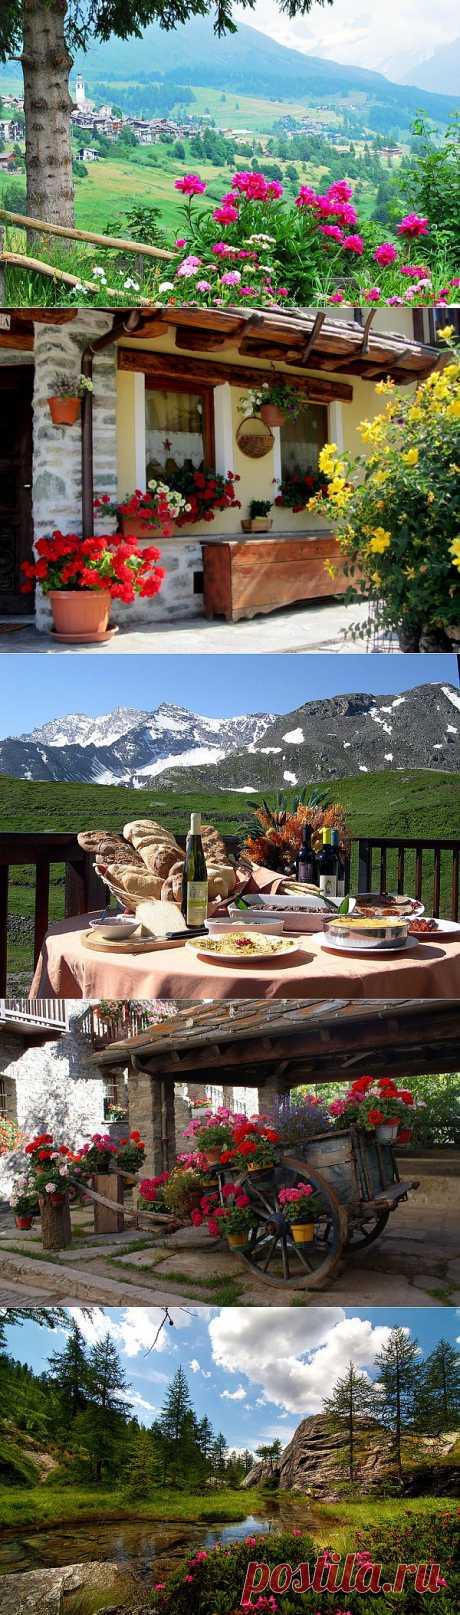 El valle Valle-d'Aosta pintoresco. Italia.